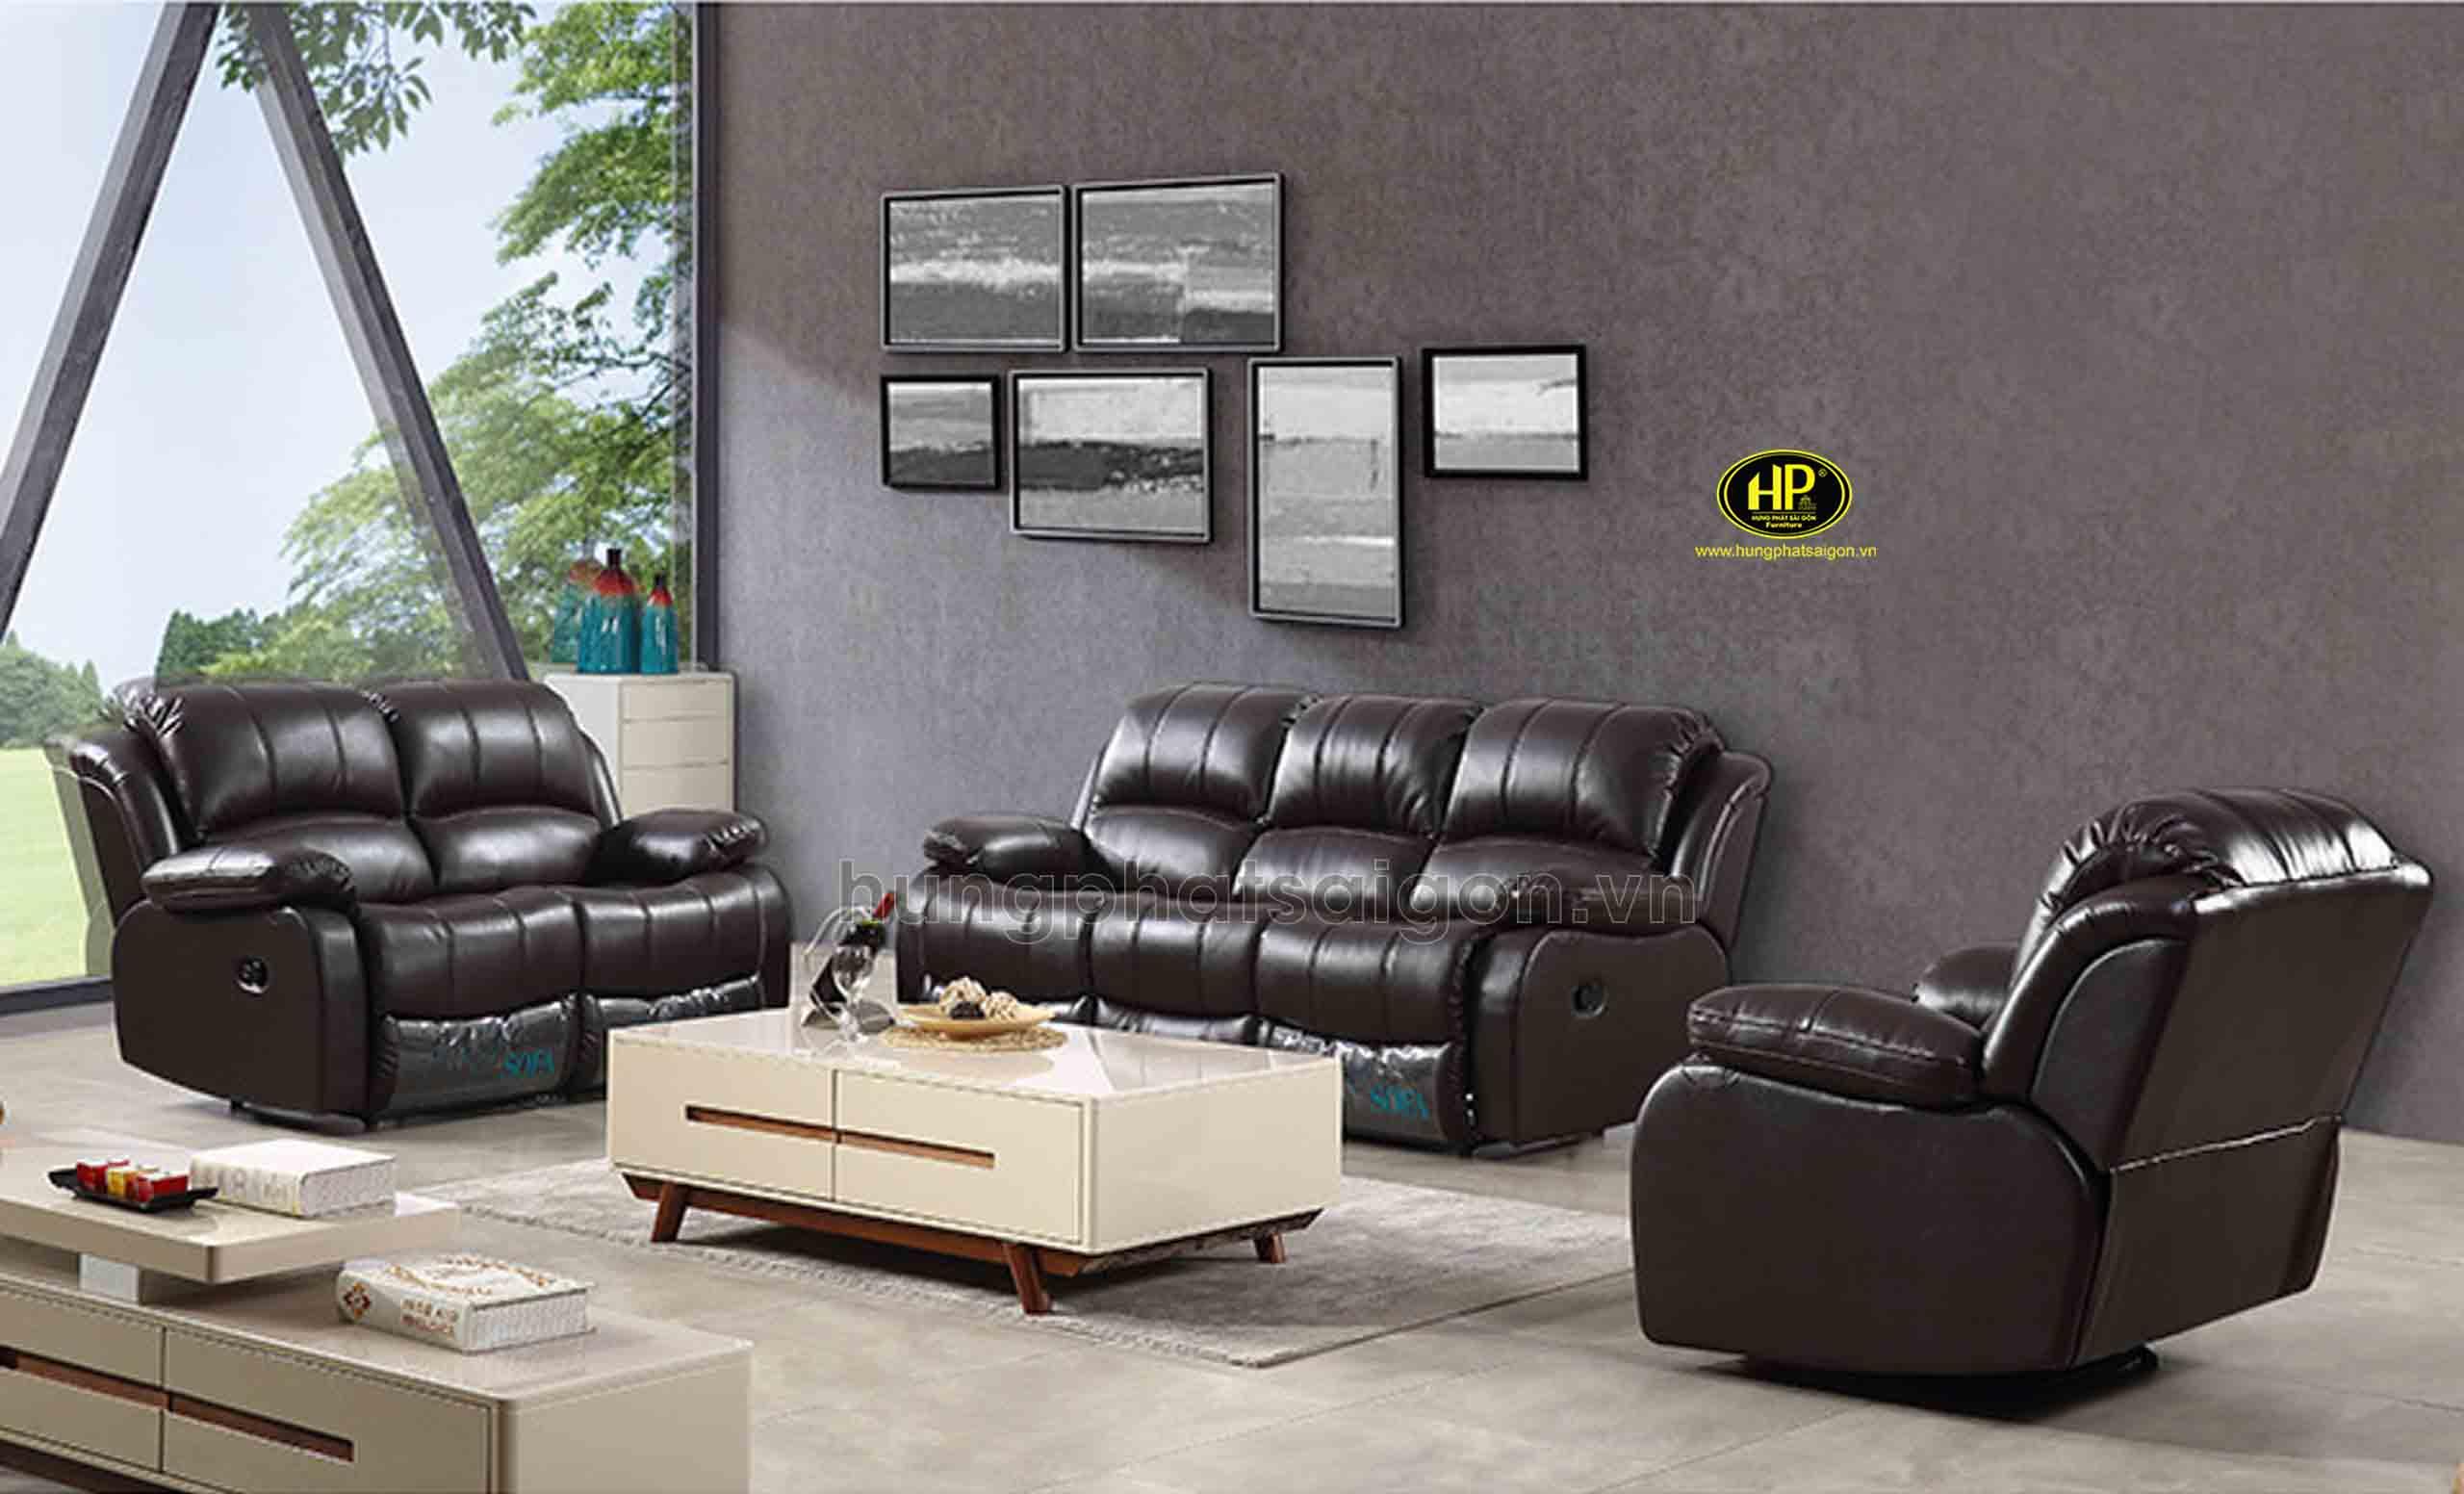 sofa da thư giãn cao cấp nhập khẩu